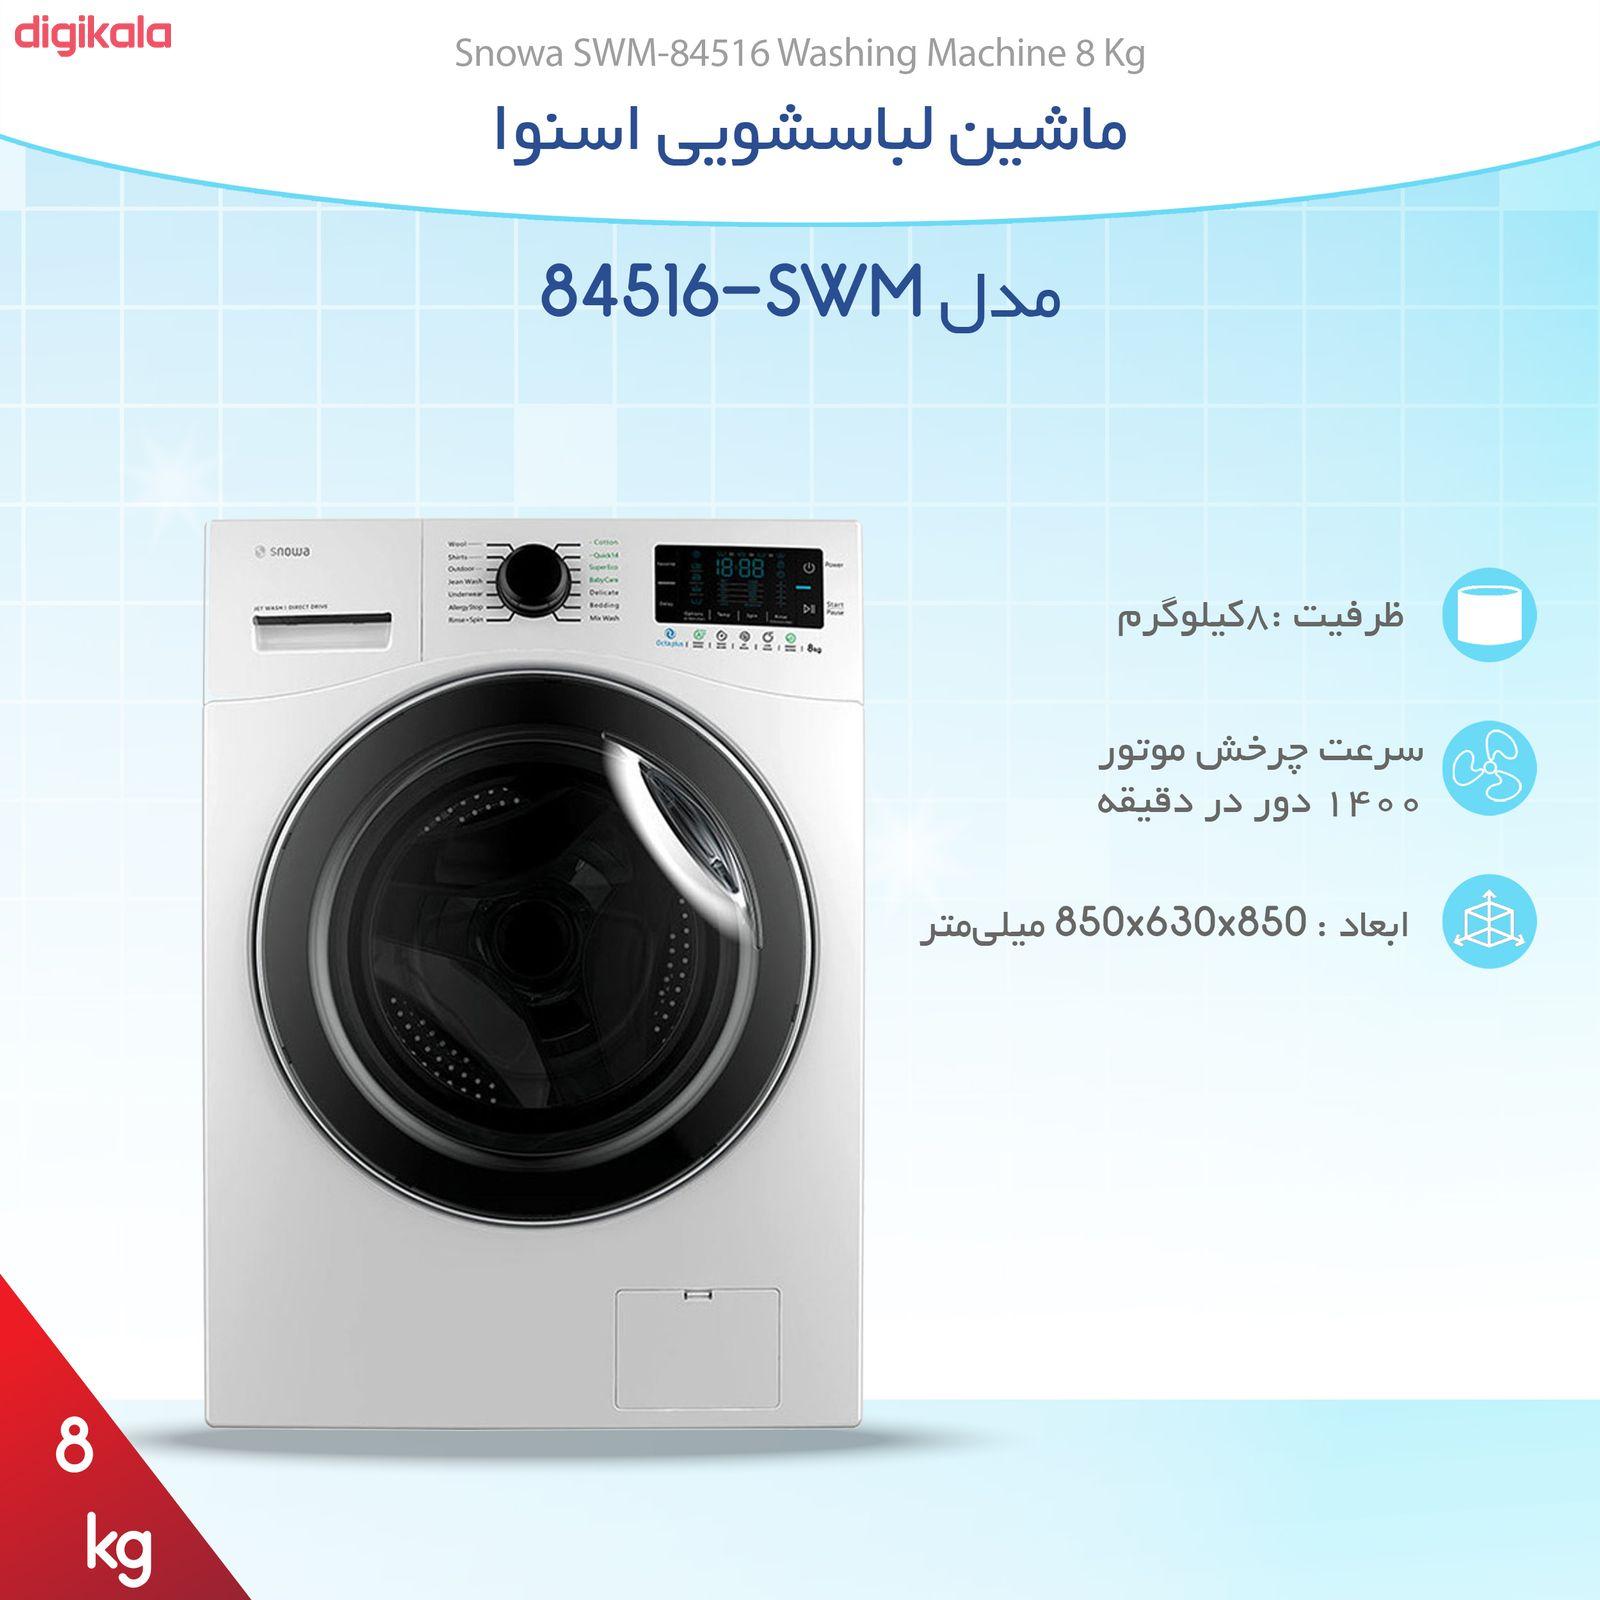 ماشین لباسشویی اسنوا مدل SWM-84516 ظرفیت 8 کیلوگرم main 1 6